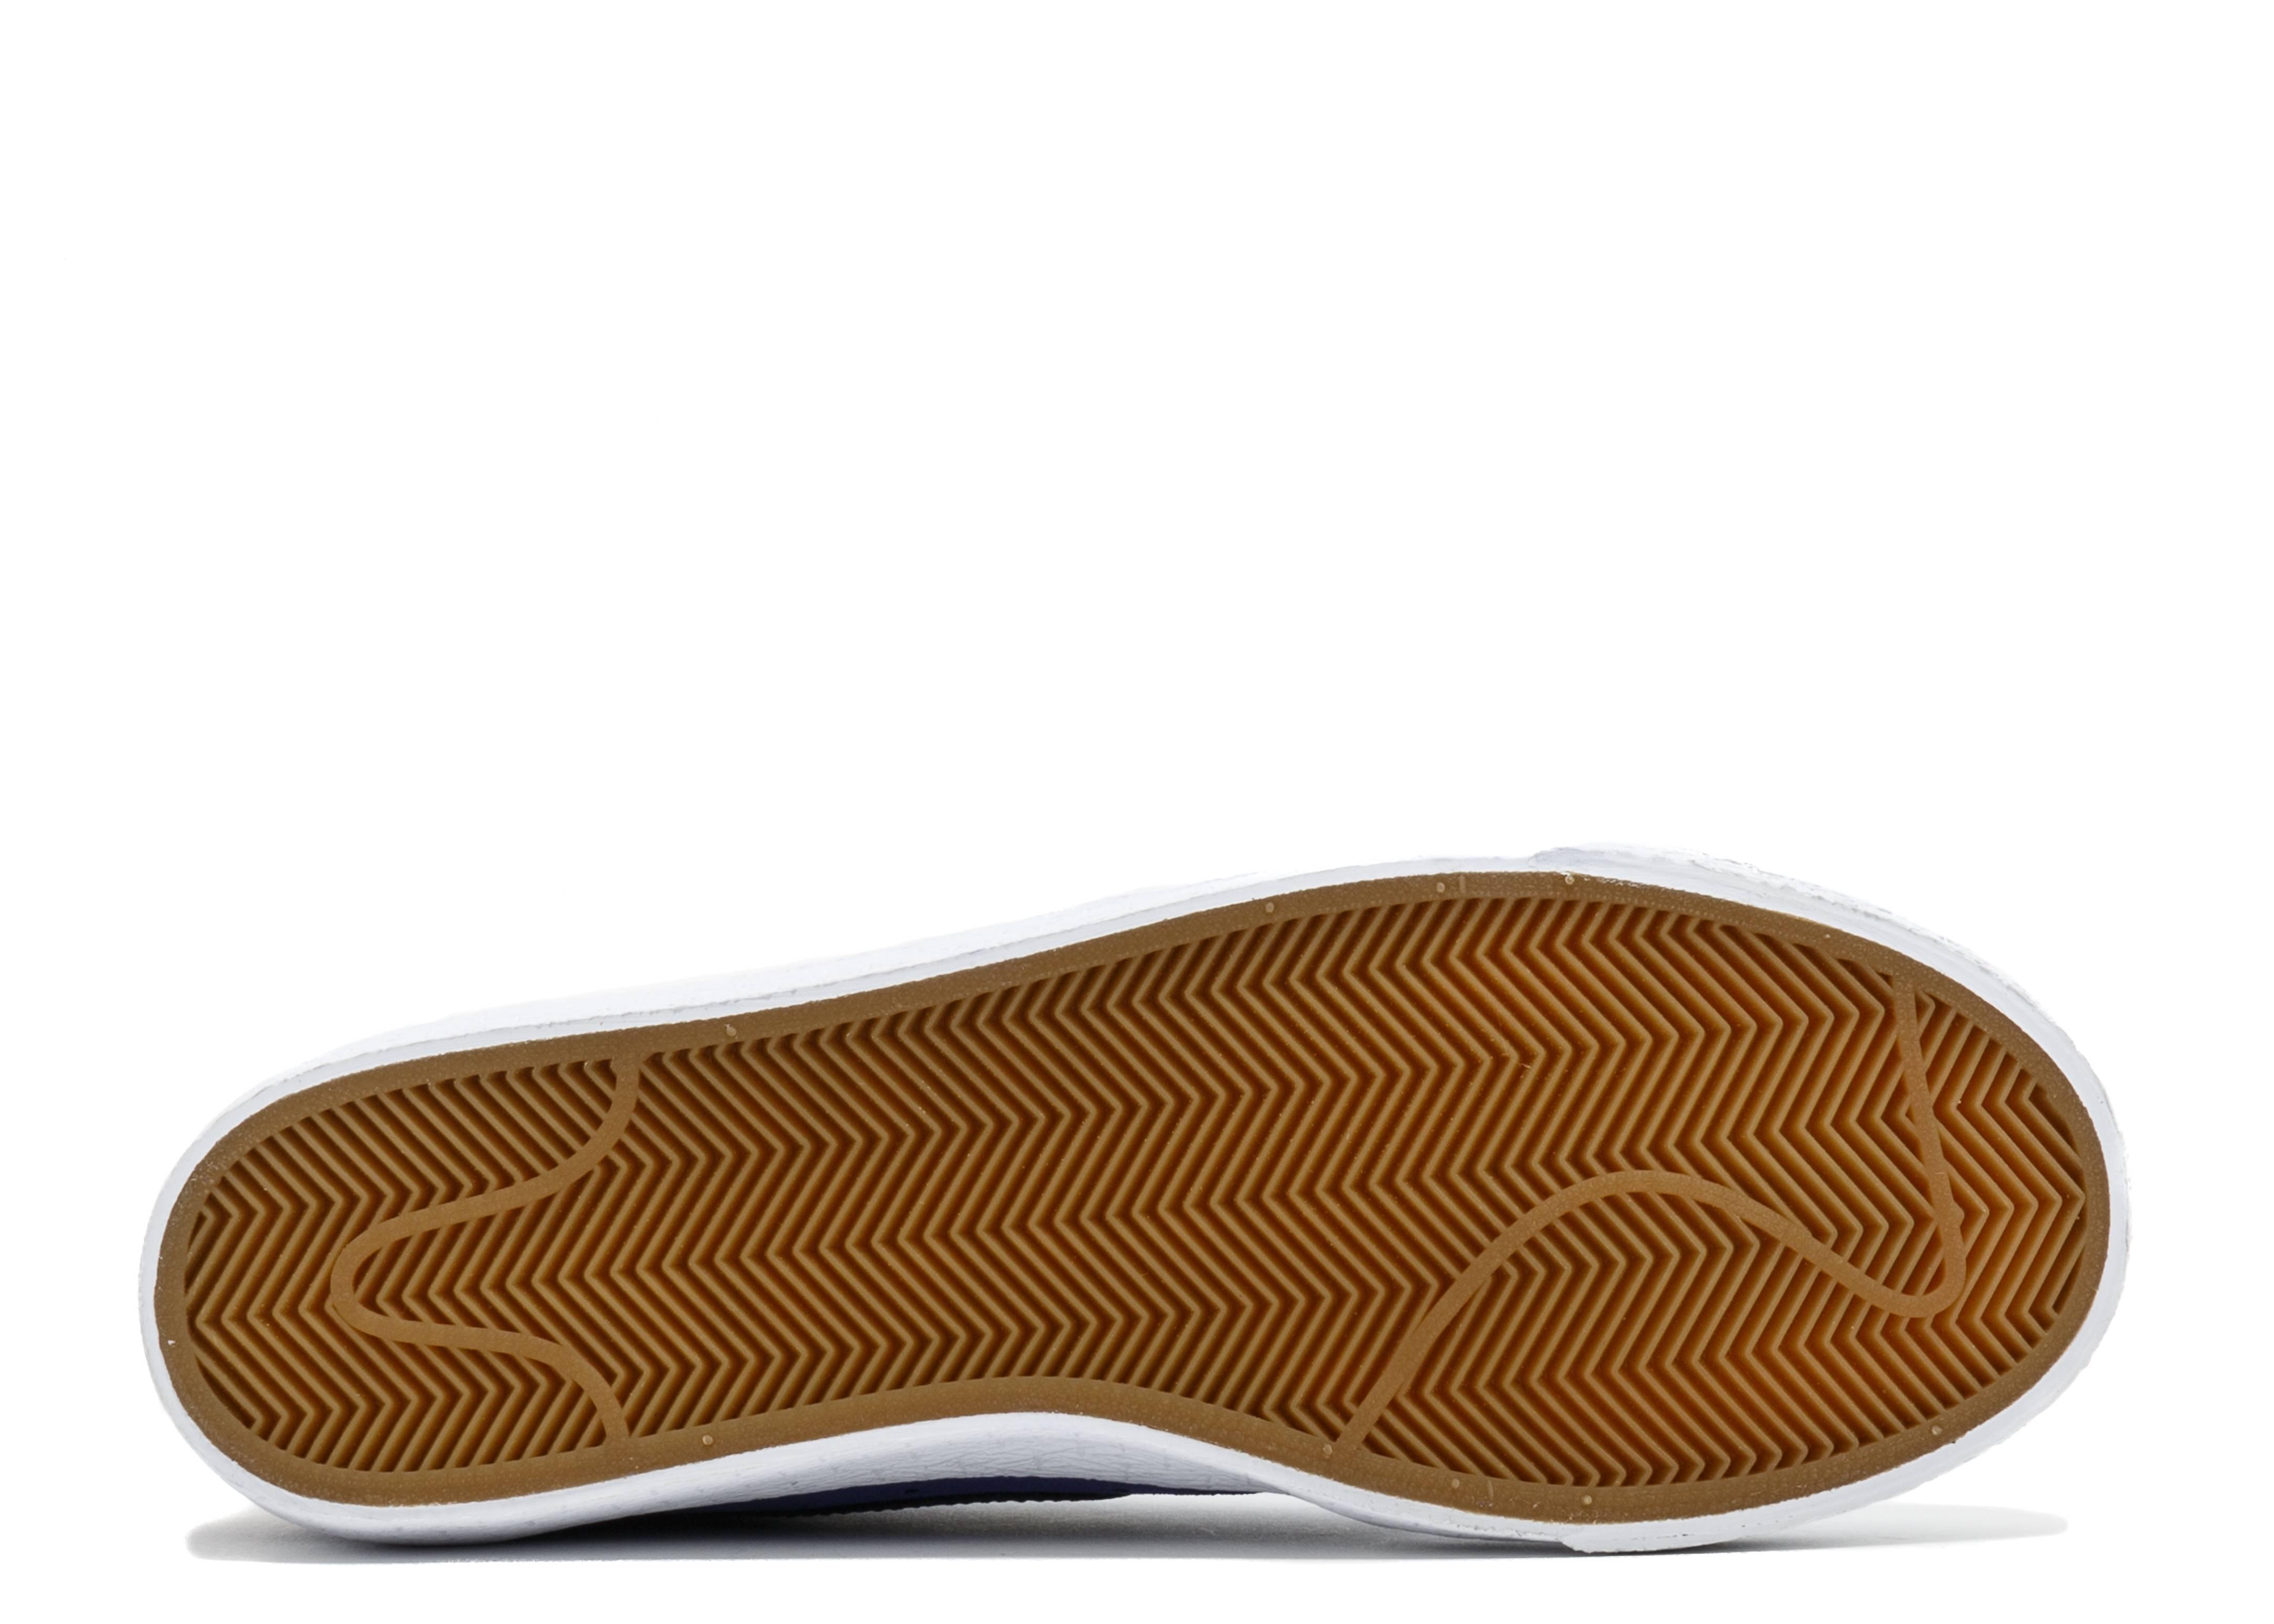 innovative design 549dc 90845 Nike Sb Blazer Zoom Low Xt - Nike - 864348 501 - deep night black-white    Flight Club